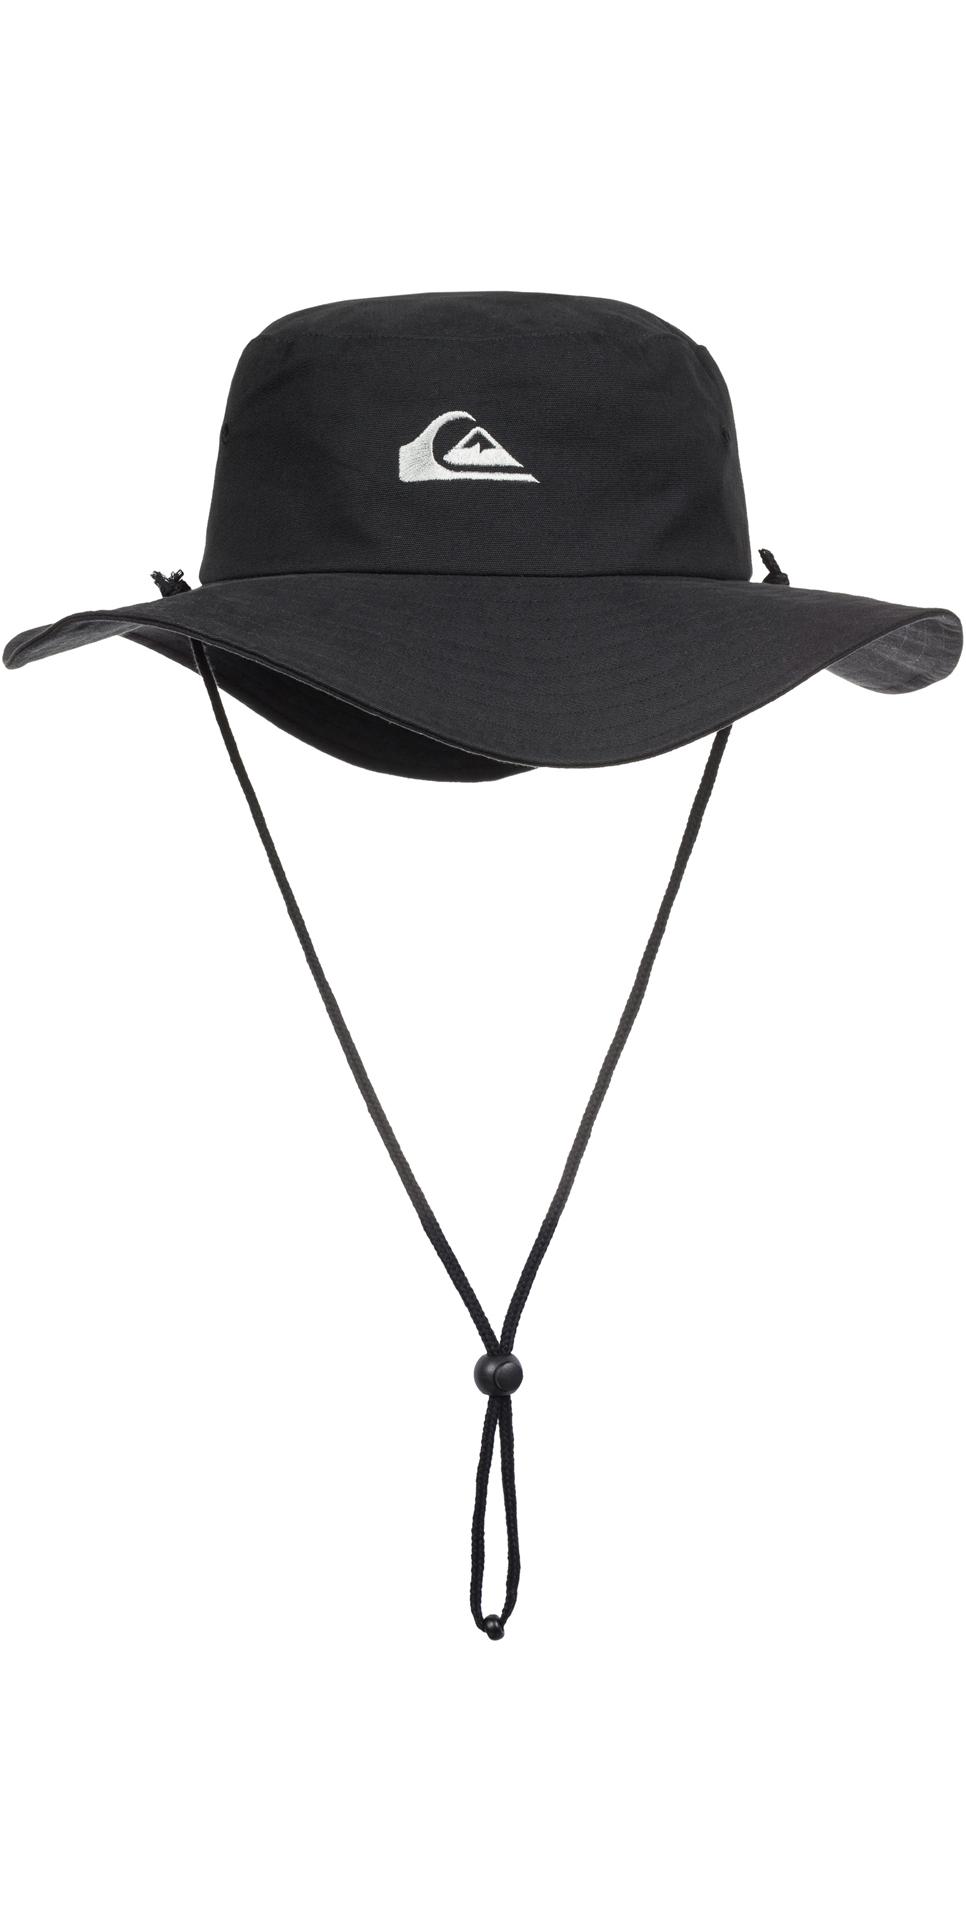 c2882c13a6122b 2019 Quiksilver Bushmaster Bucket Hat Black Aqyha03314 - Accessories - Mens  - Clothing | Wetsuit Outlet